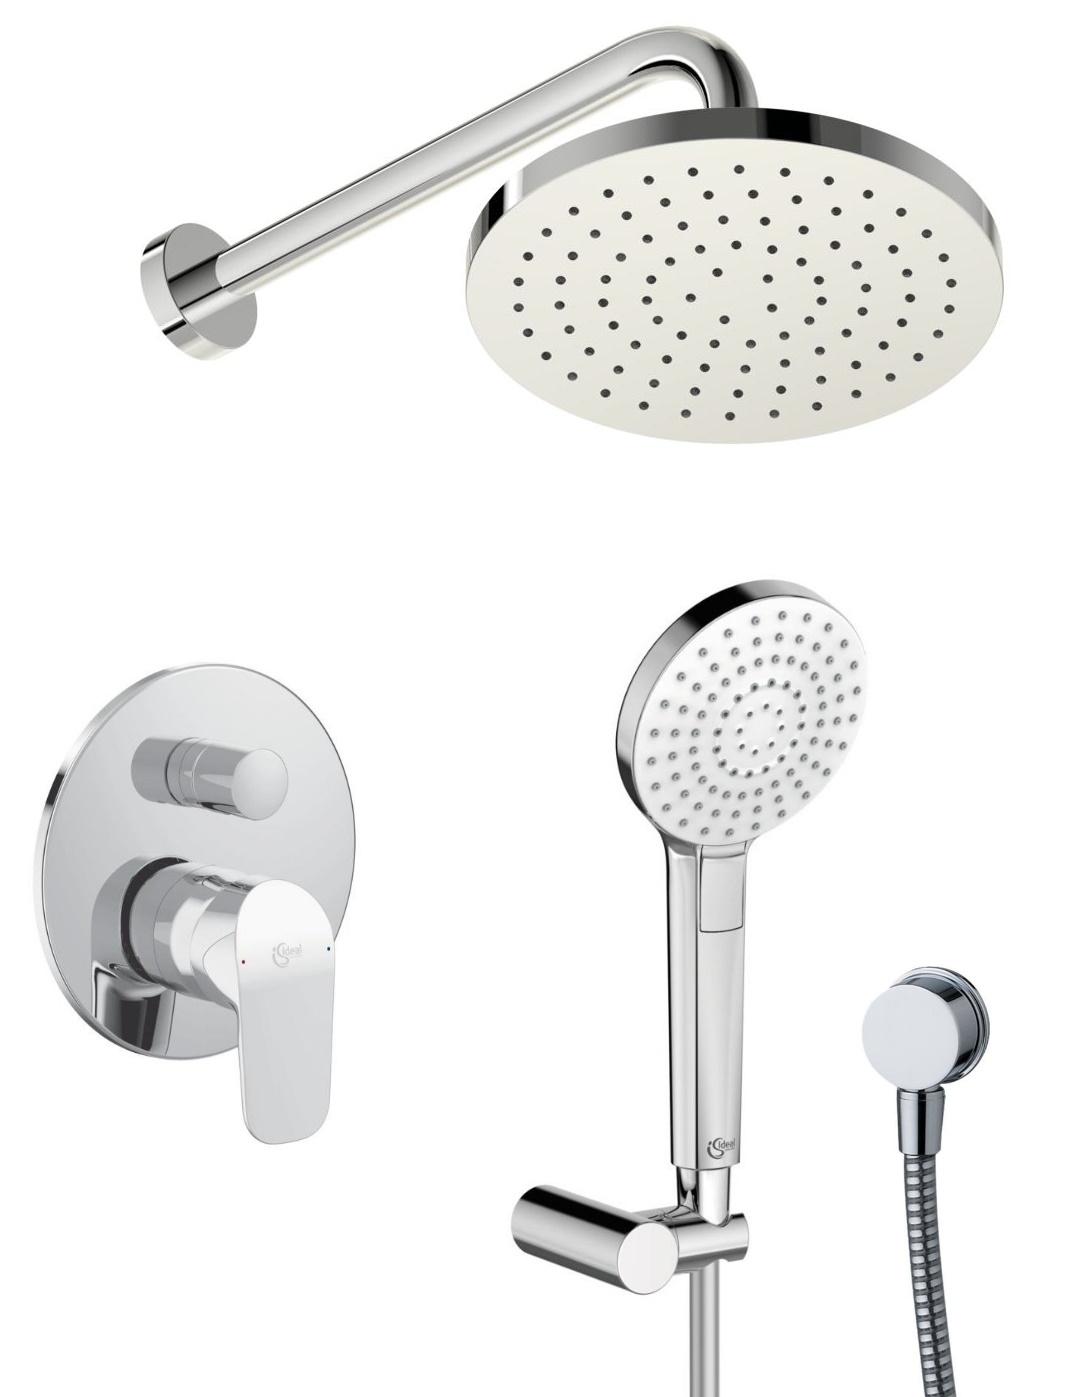 Sistem de dus incastrat Ideal Standard Ceraflex Ideal Rain Evo cu 2 consumatori imagine